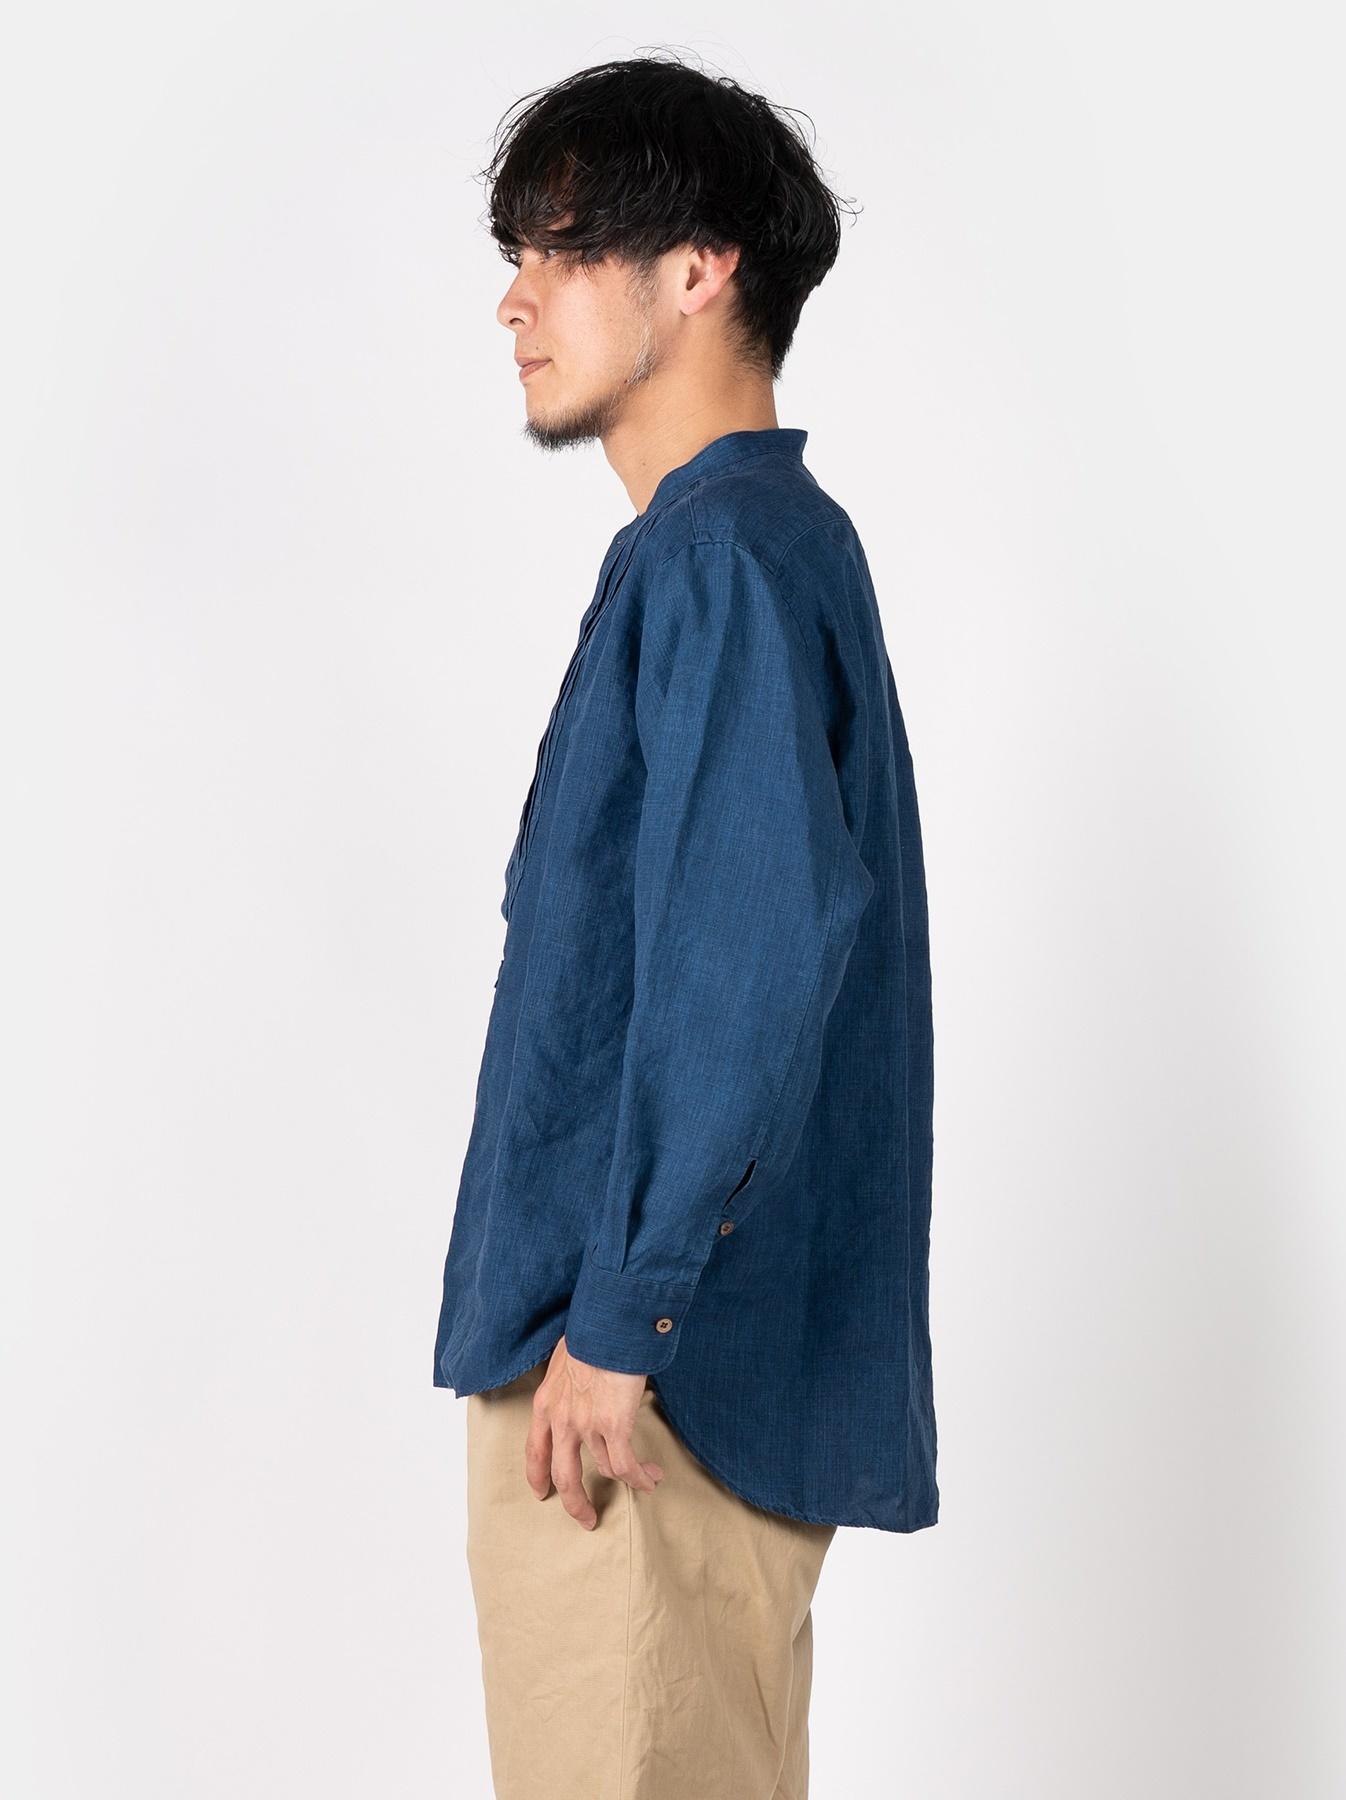 WH Indigo Linen Pin-tuck 908 Shirt-3